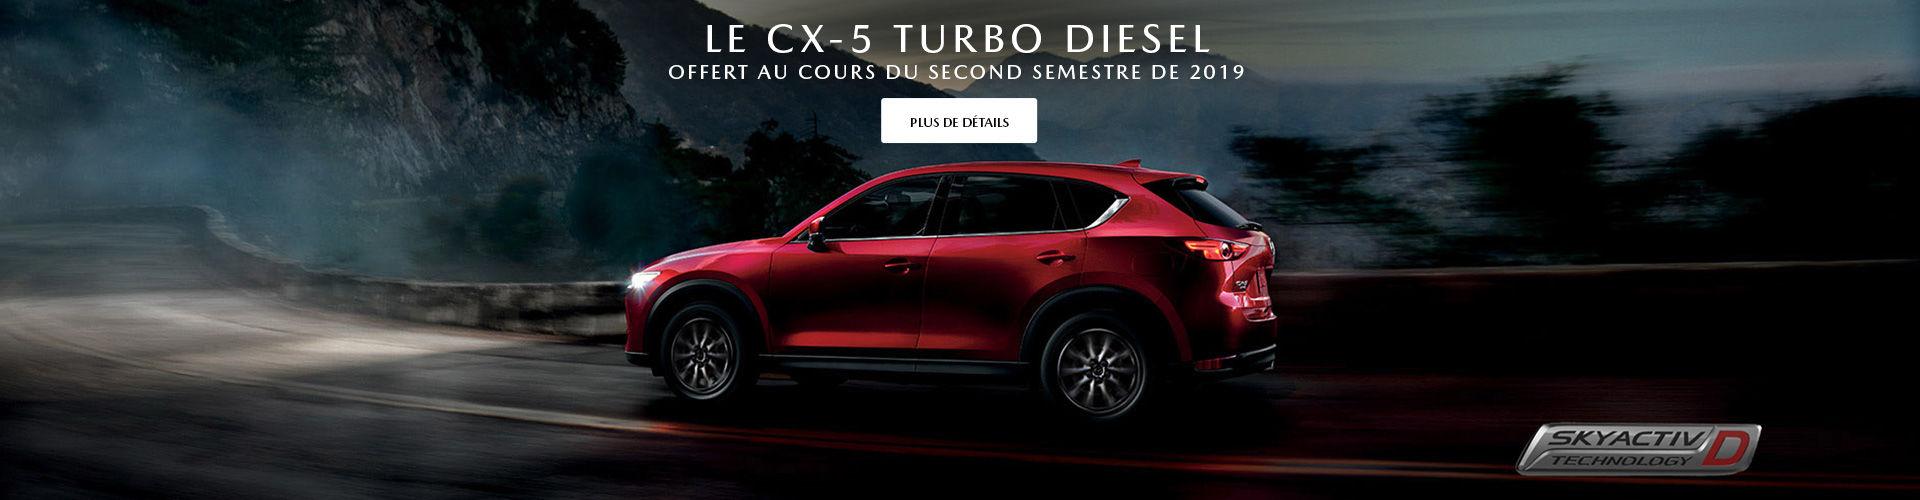 Le CX-5 Turbo Diesel